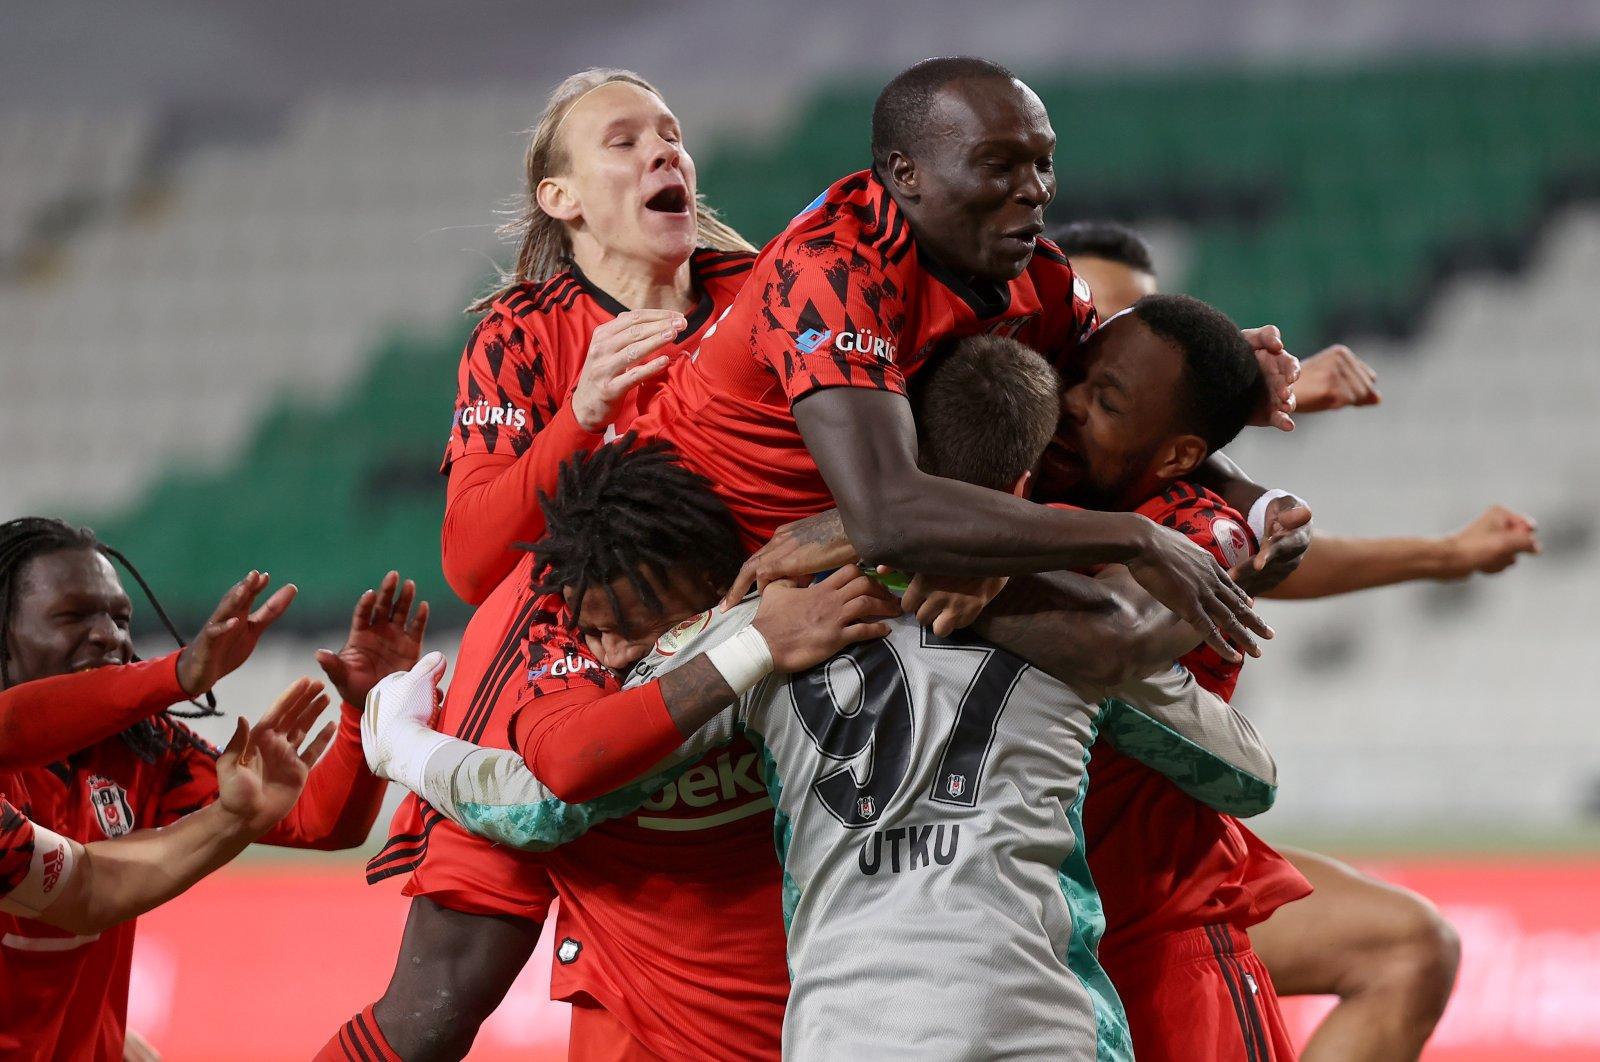 Beşiktaş players celebrate after defeating Konyaspor in the Ziraat Turkish Cup quarterfinals, in Konya, central Turkey, Feb. 11, 2021. (AA Photo)